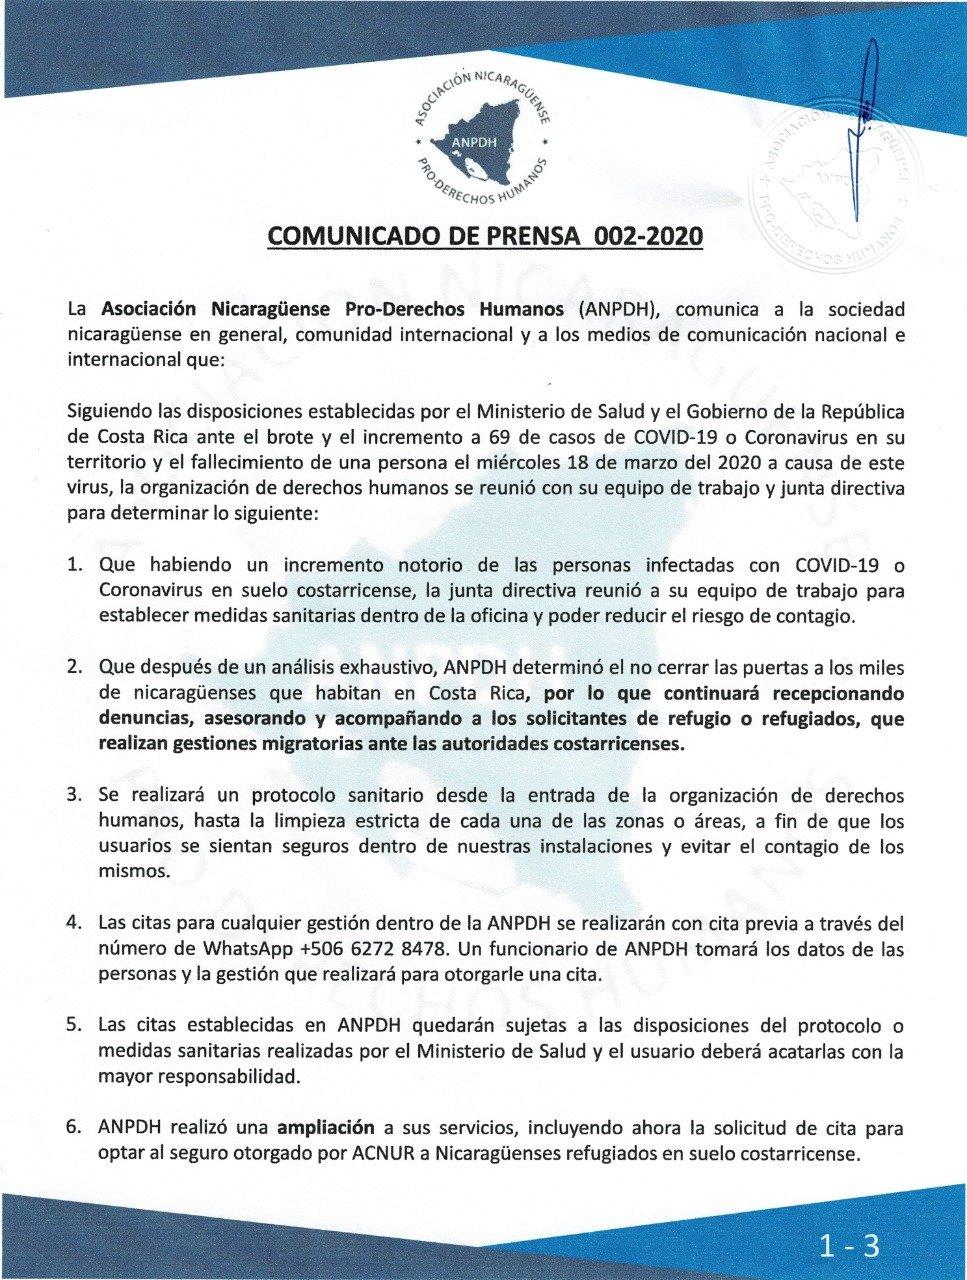 COMUNICADO-DE-PRENSA-02-2020-01.jpg